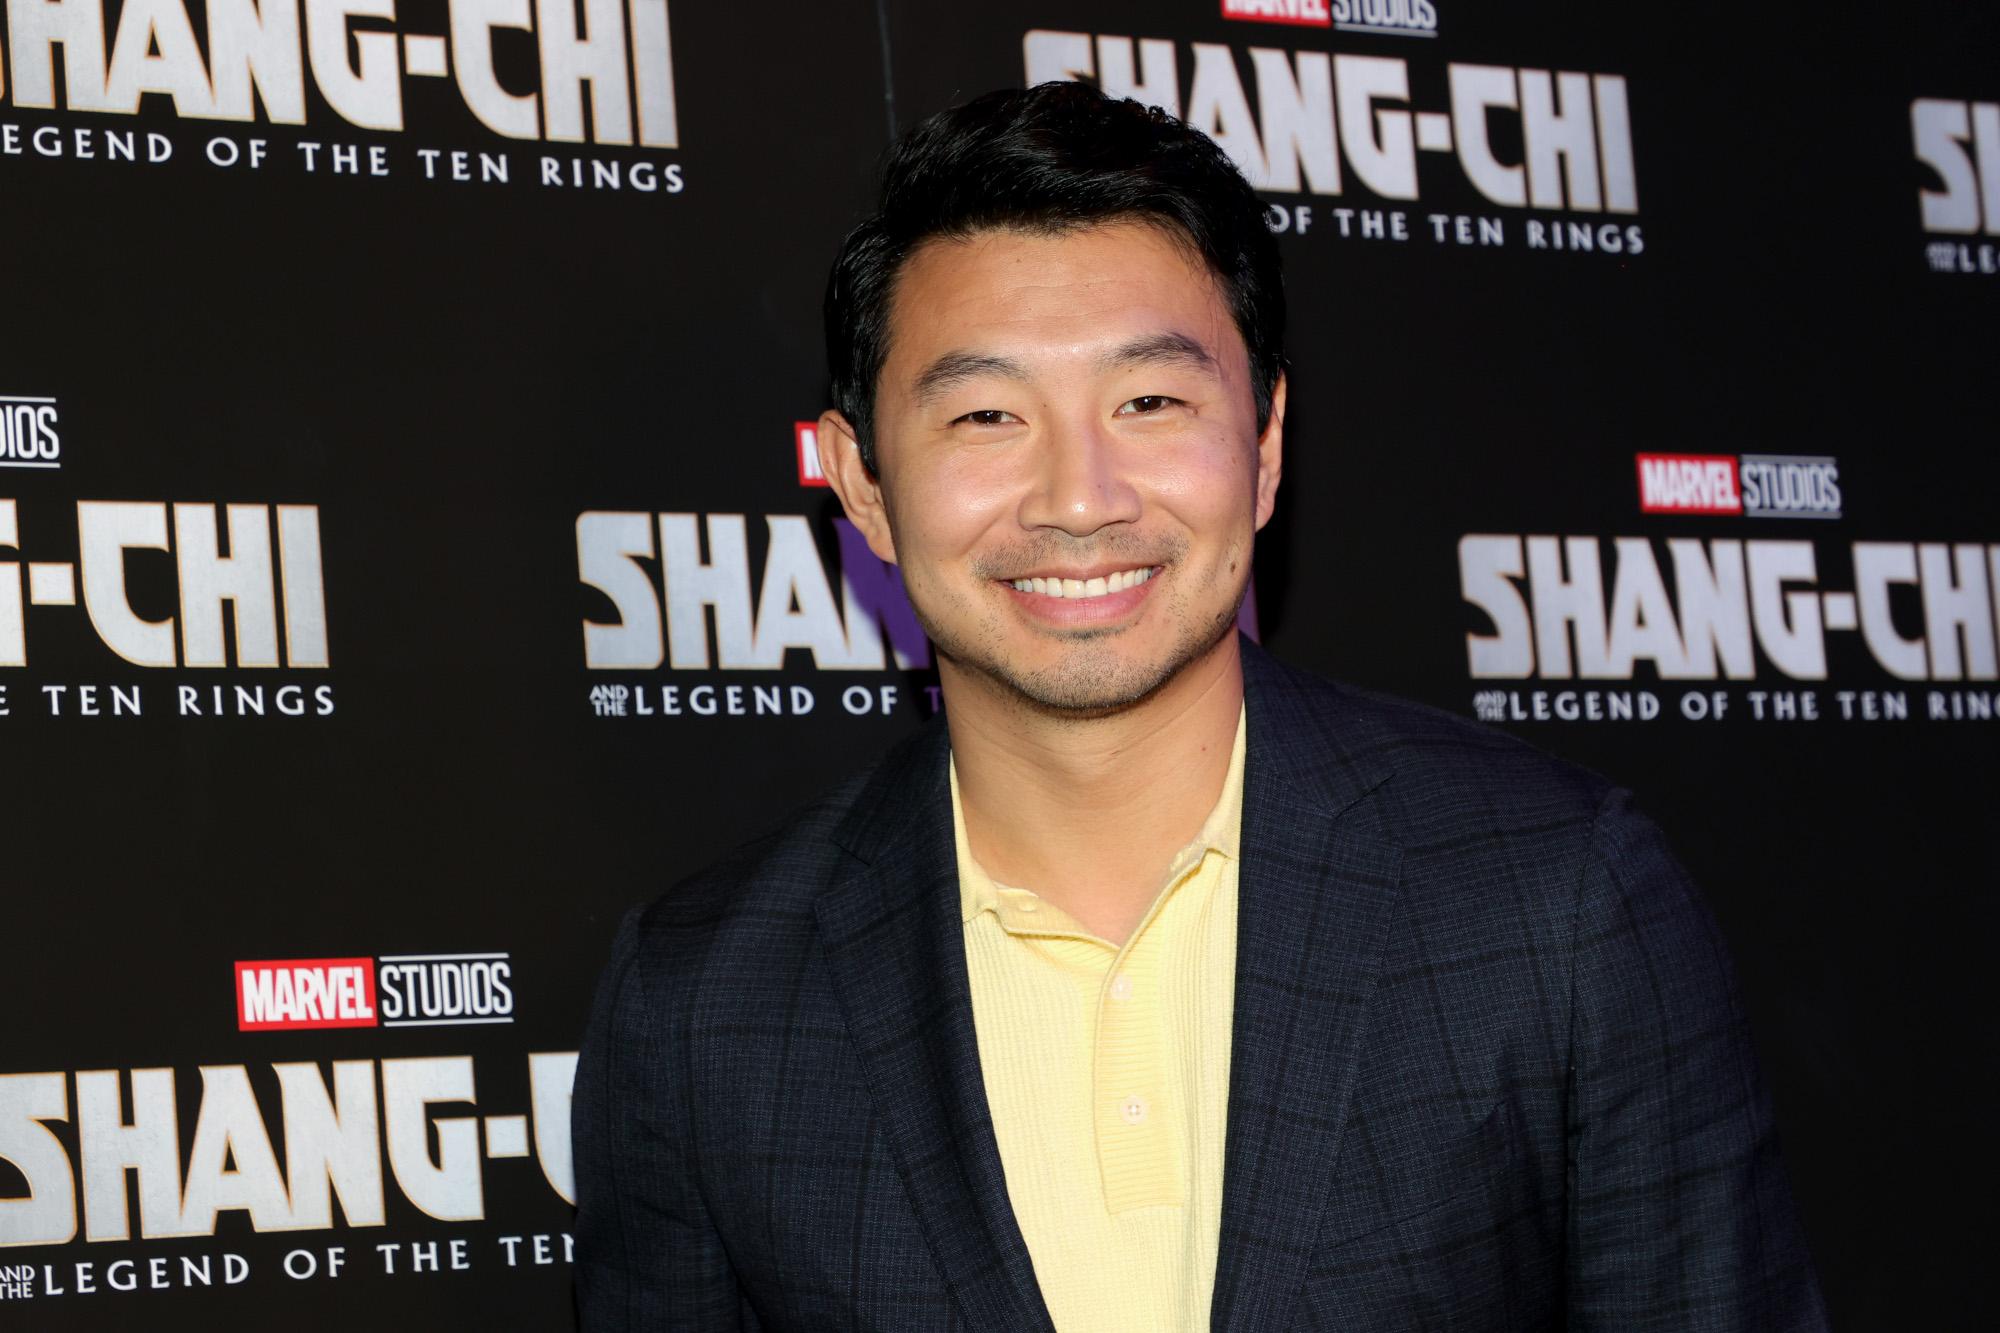 What Is 'Shang-Chi' Star Simu Liu's Net Worth?